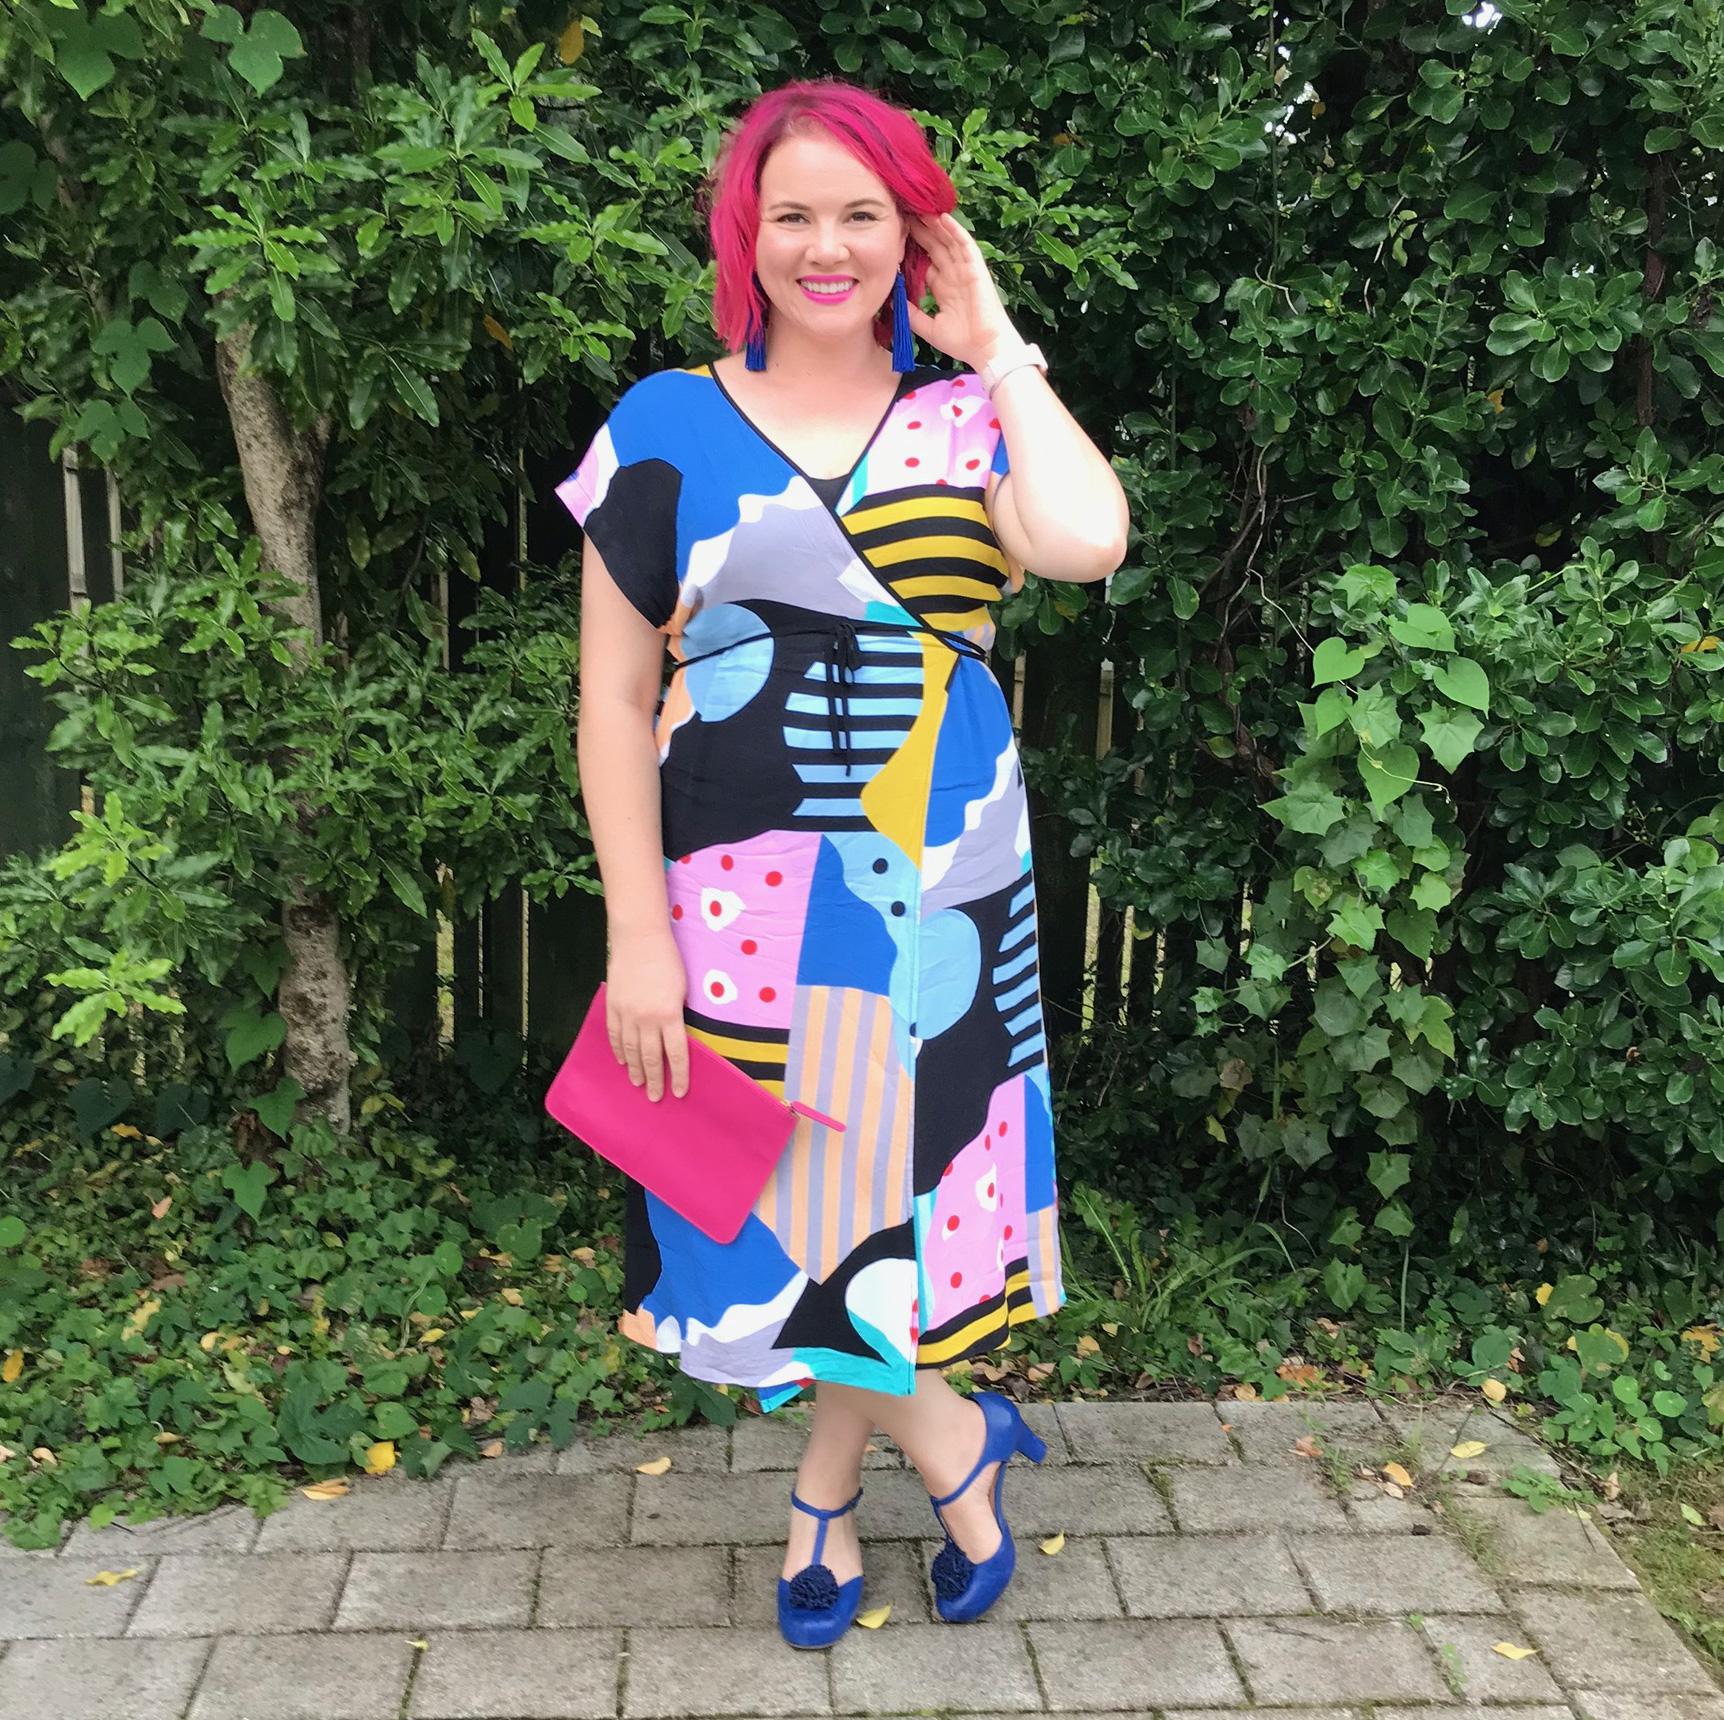 Gorman dress, Lovisa earrings, Merchant clutch, Mi Piaci shoes.